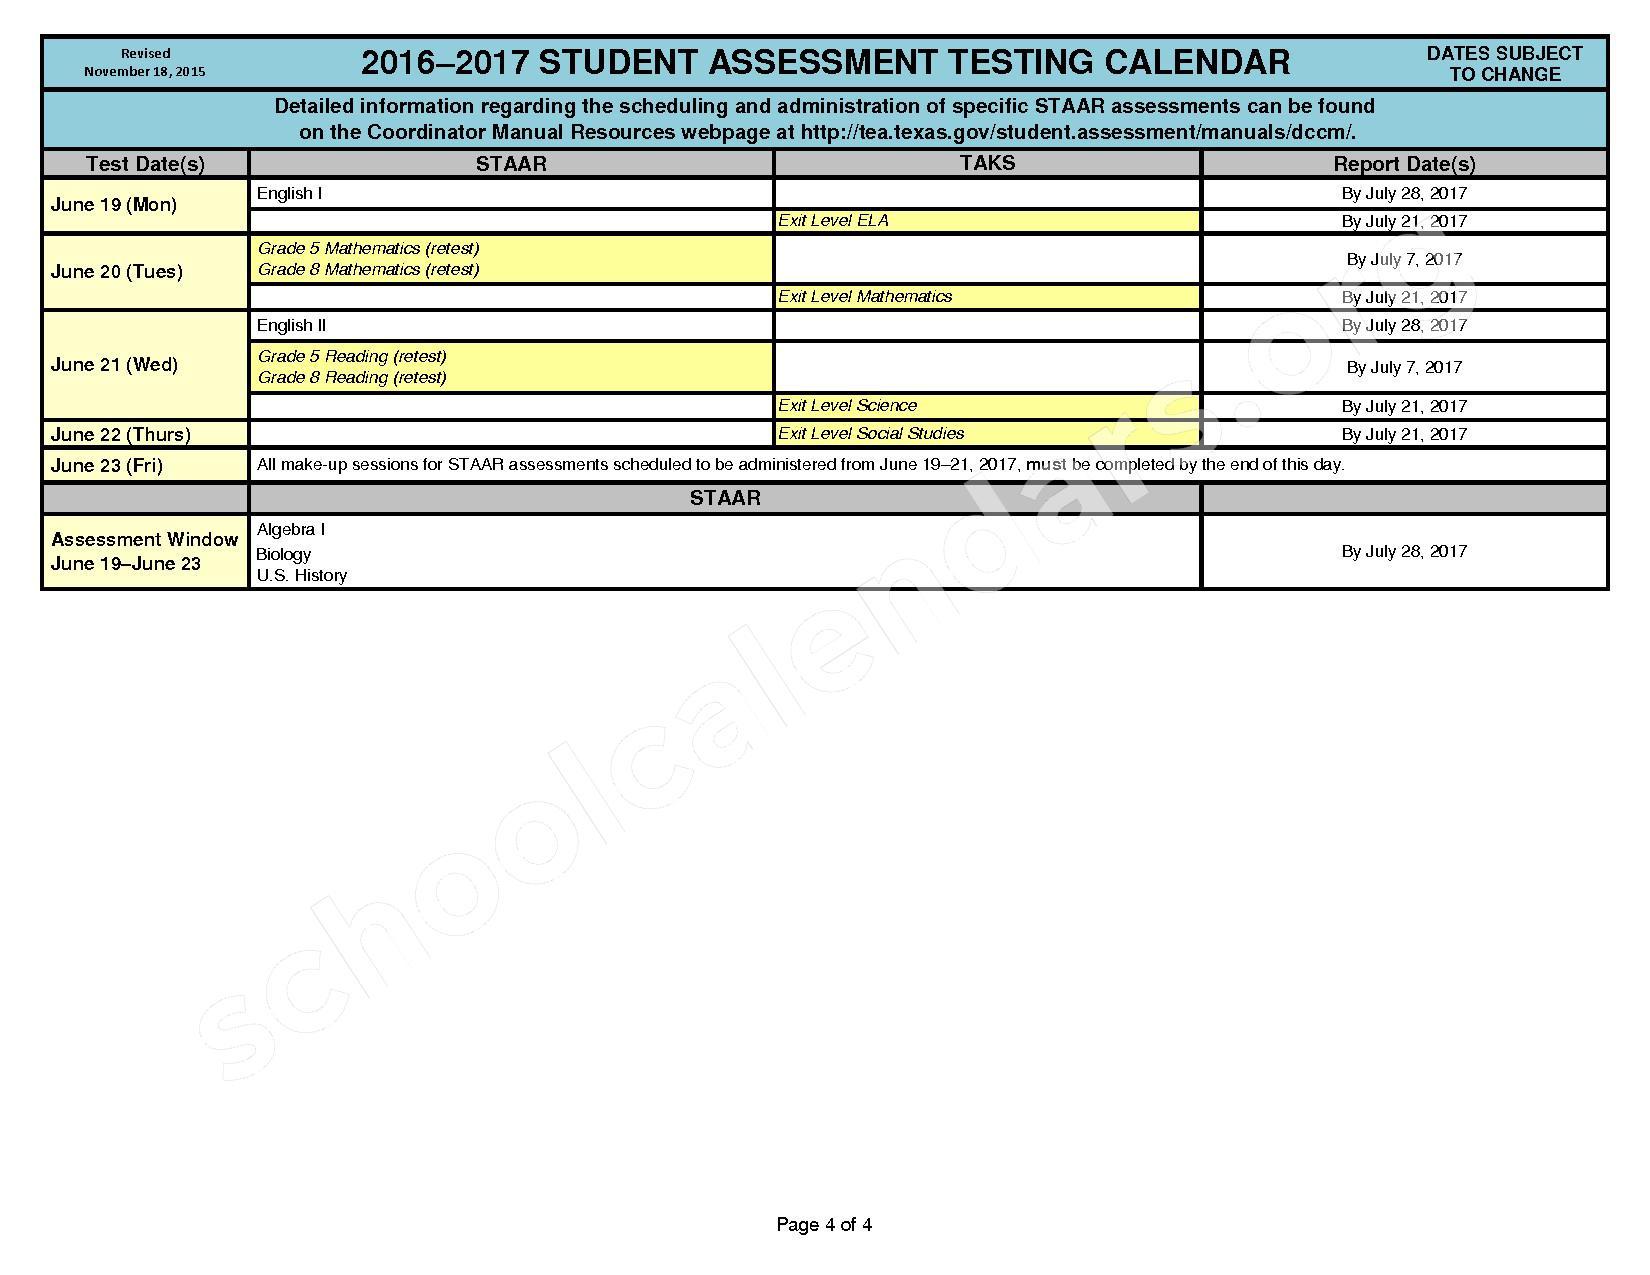 2016 - 2017 District Calendar – Georgetown Independent School District – page 4